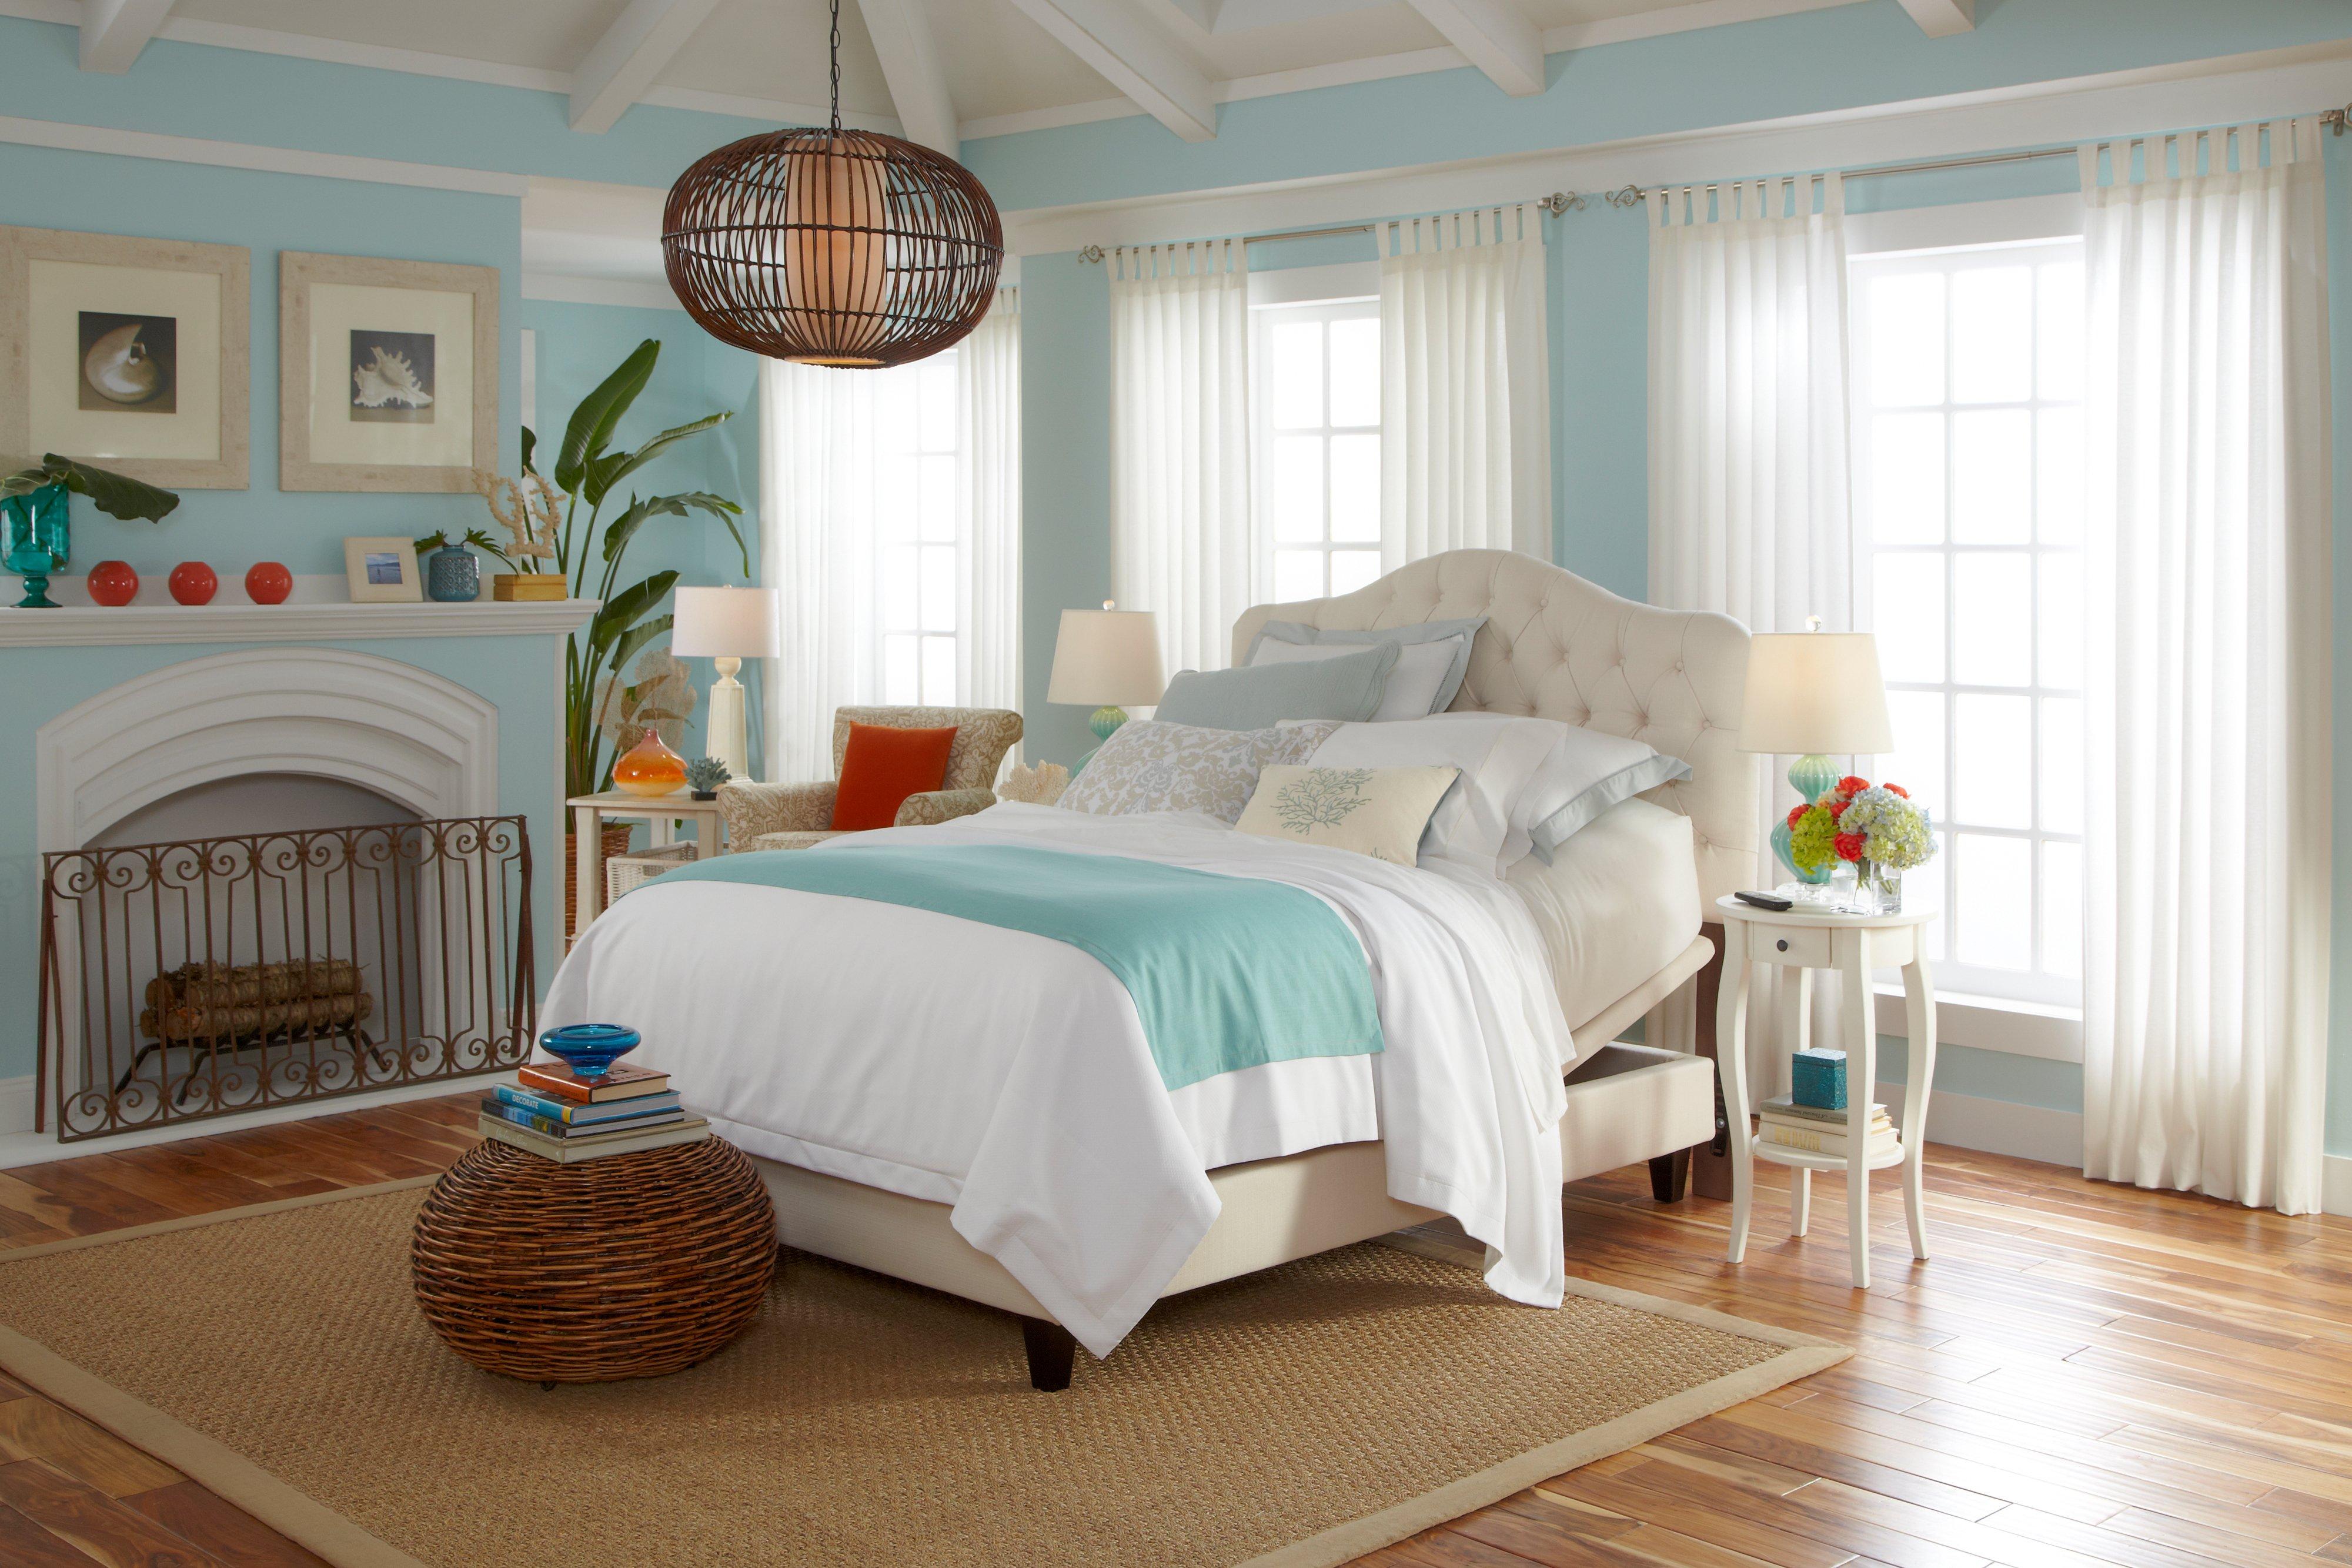 top-english-bedroom-design-room-design-decor-unique-in-english-bedroom-design-interior-design-ideas